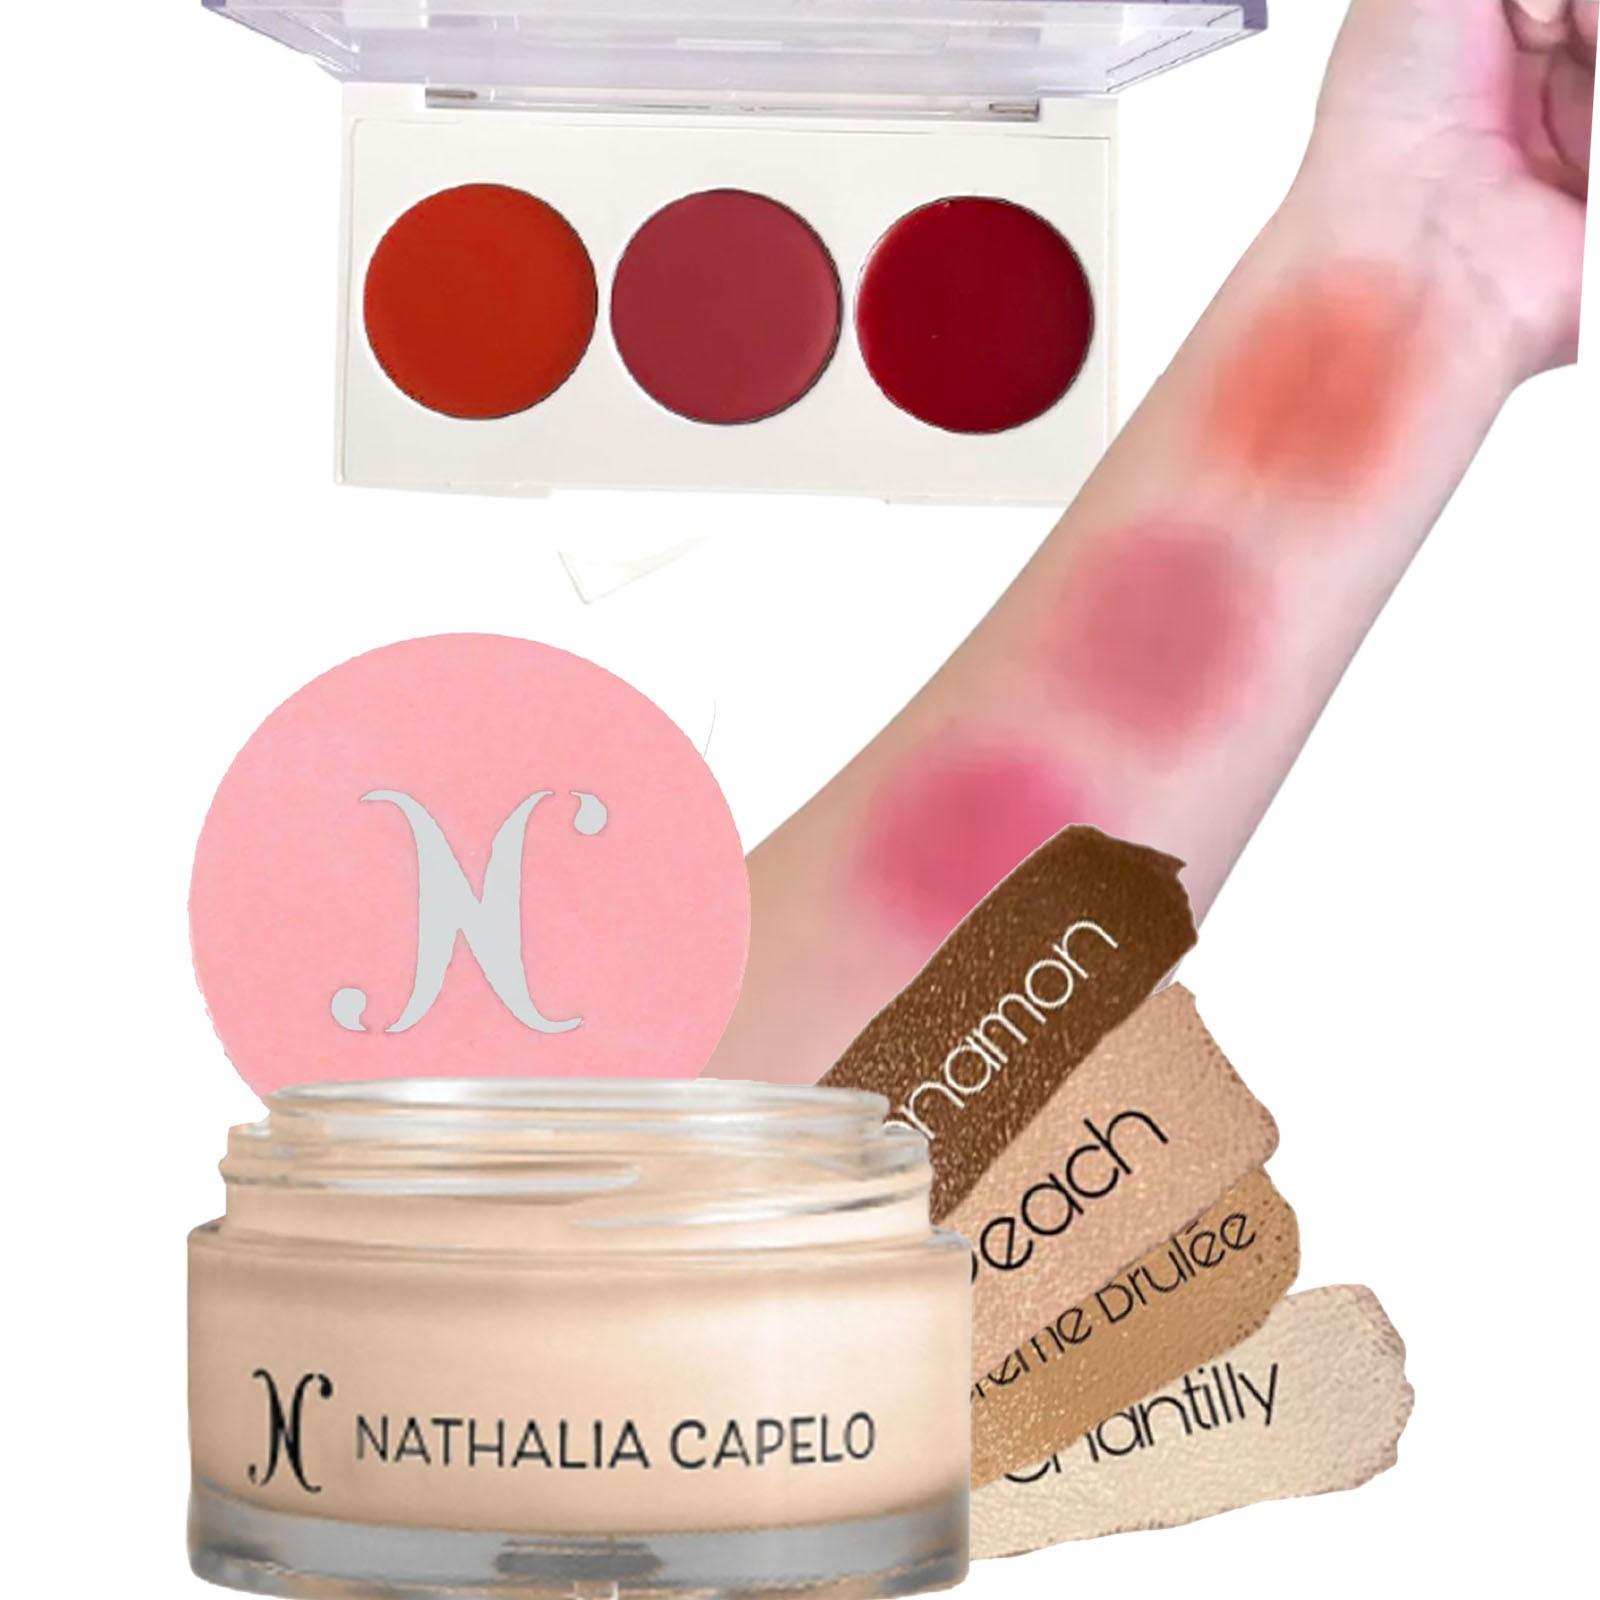 Kit Nathalia Capelo Camuflagem La mousse + Paleta de Blush & cheek